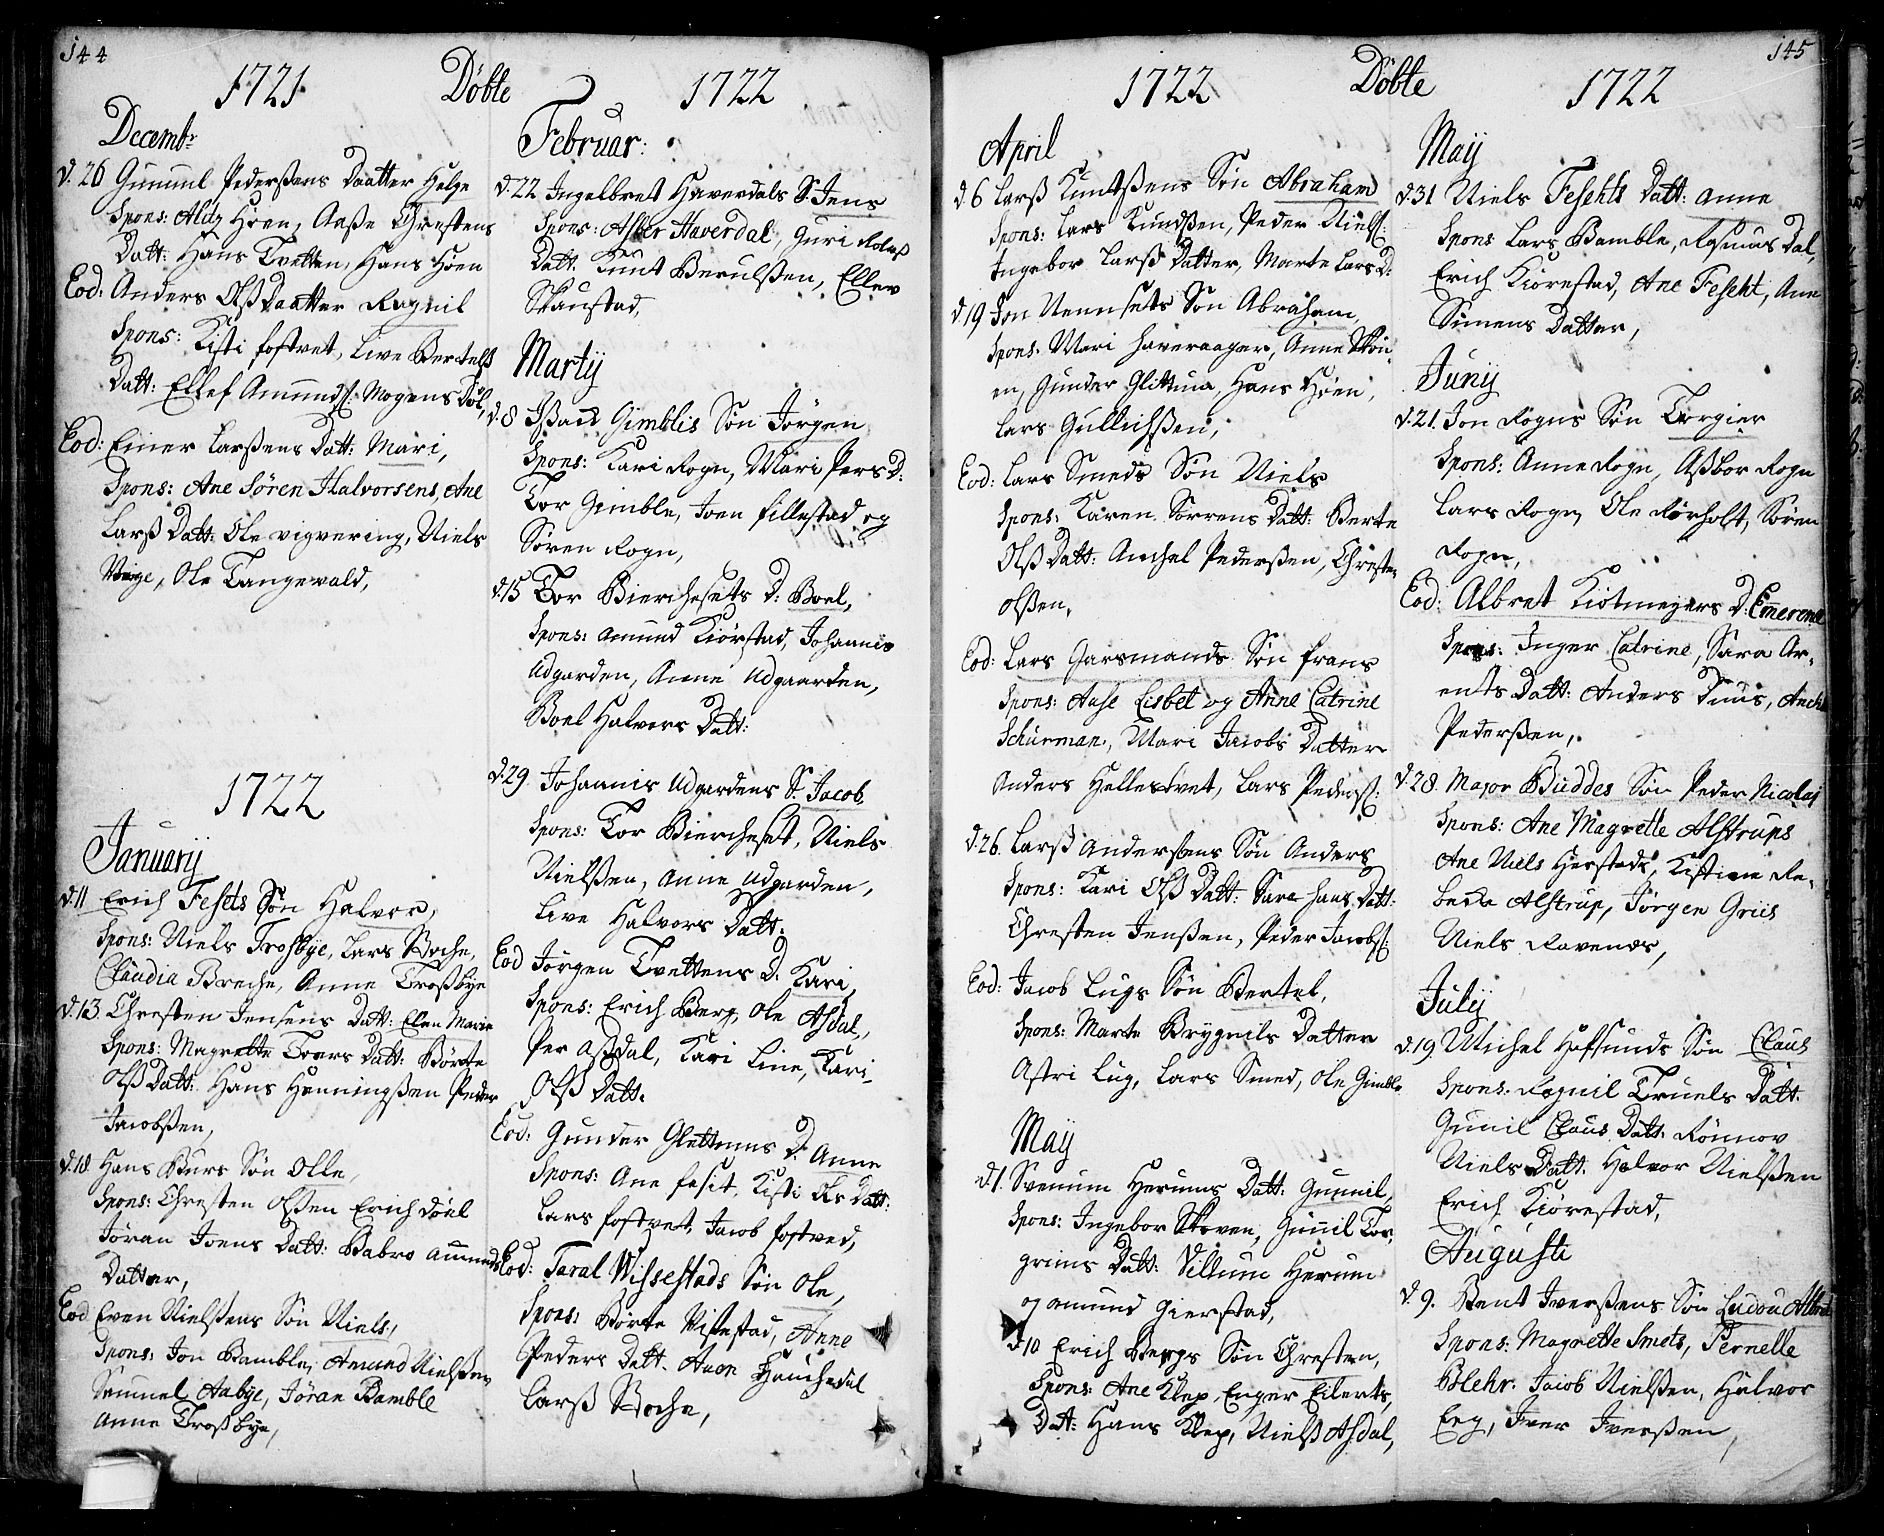 SAKO, Bamble kirkebøker, F/Fa/L0001: Ministerialbok nr. I 1, 1702-1774, s. 144-145